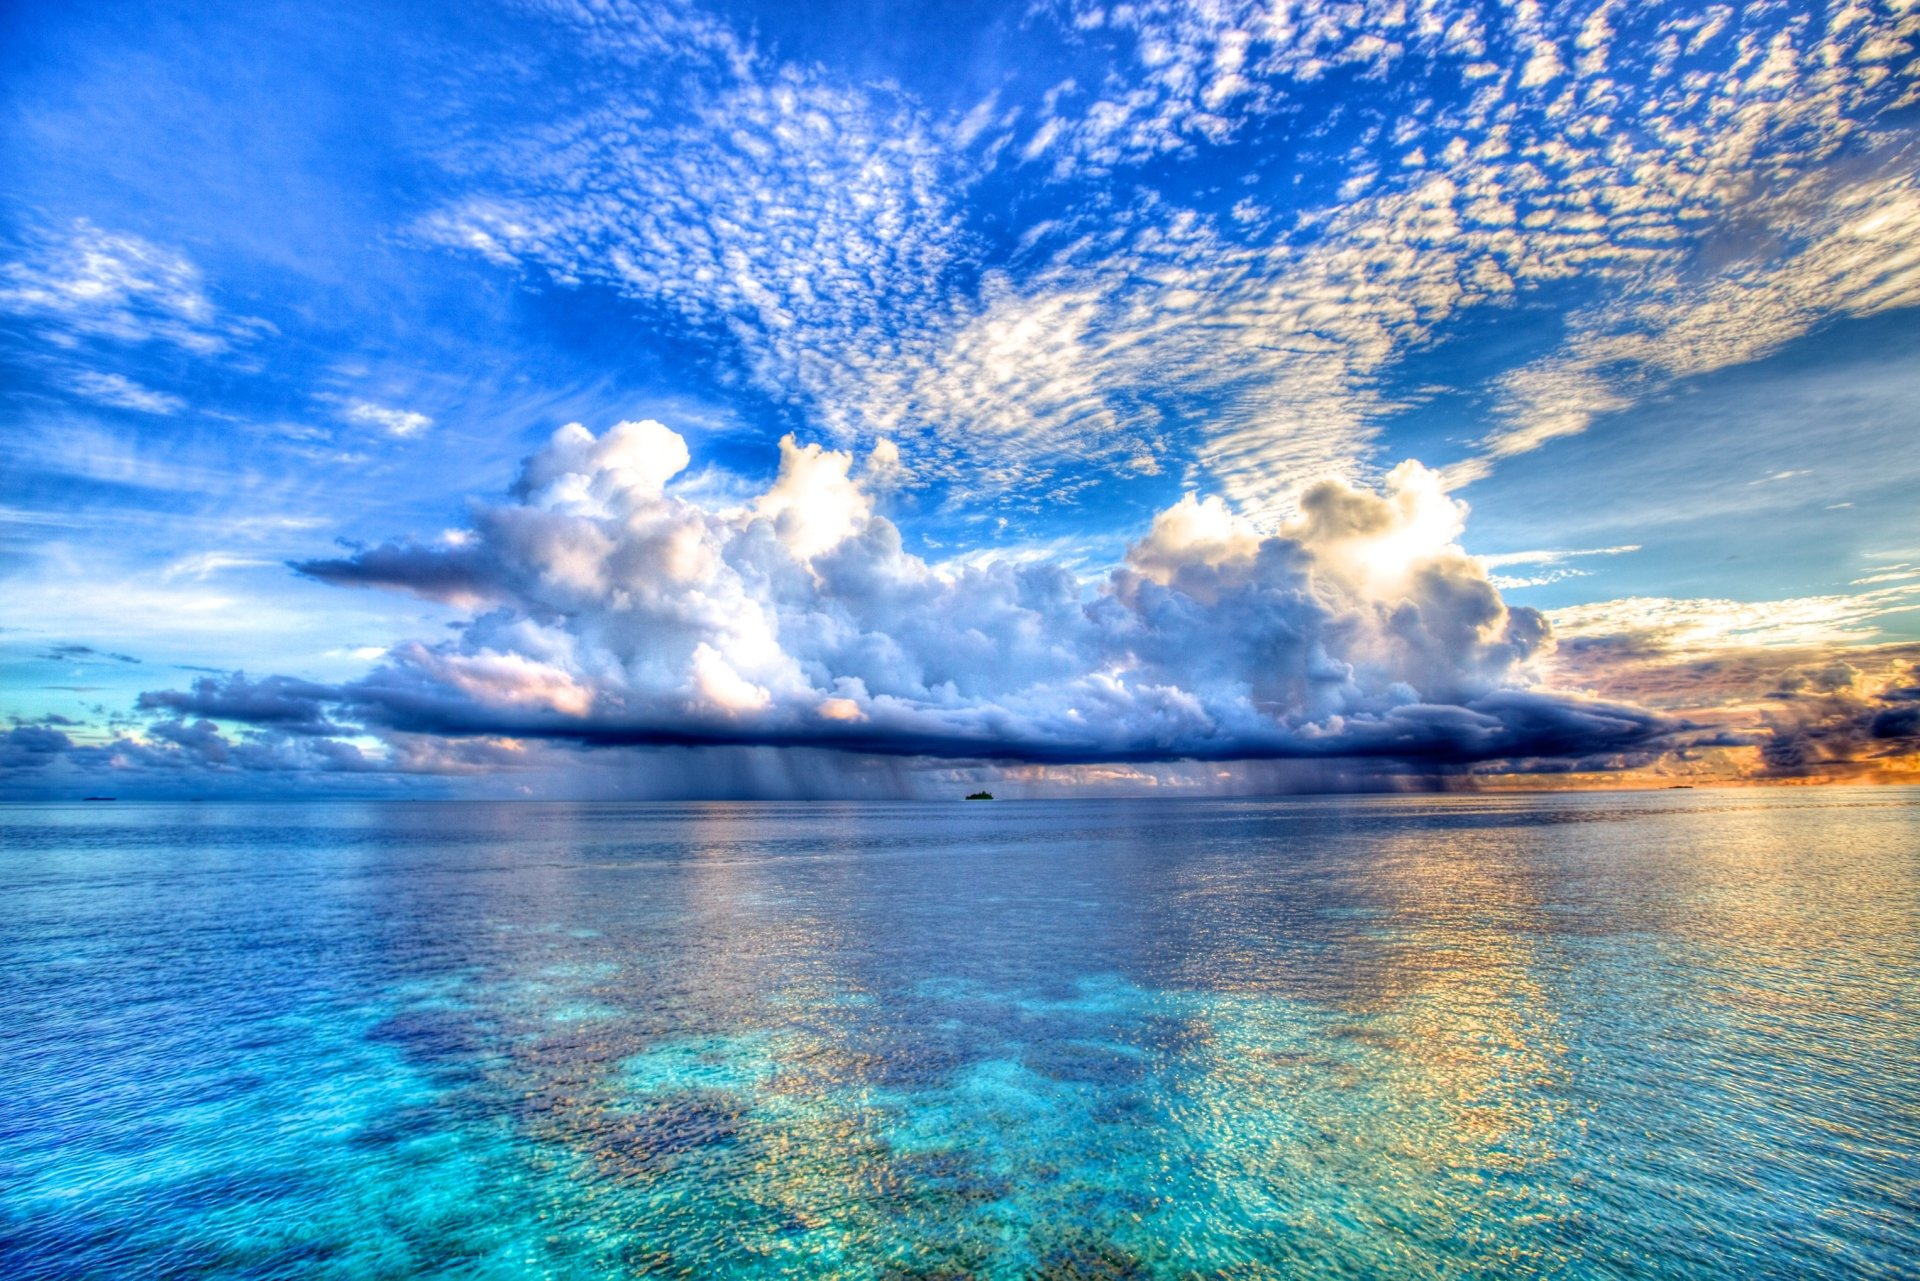 Terra/Natureza - Oceano  Nuvem Paisagem Água Céu Horizon Natureza Maldives Papel de Parede